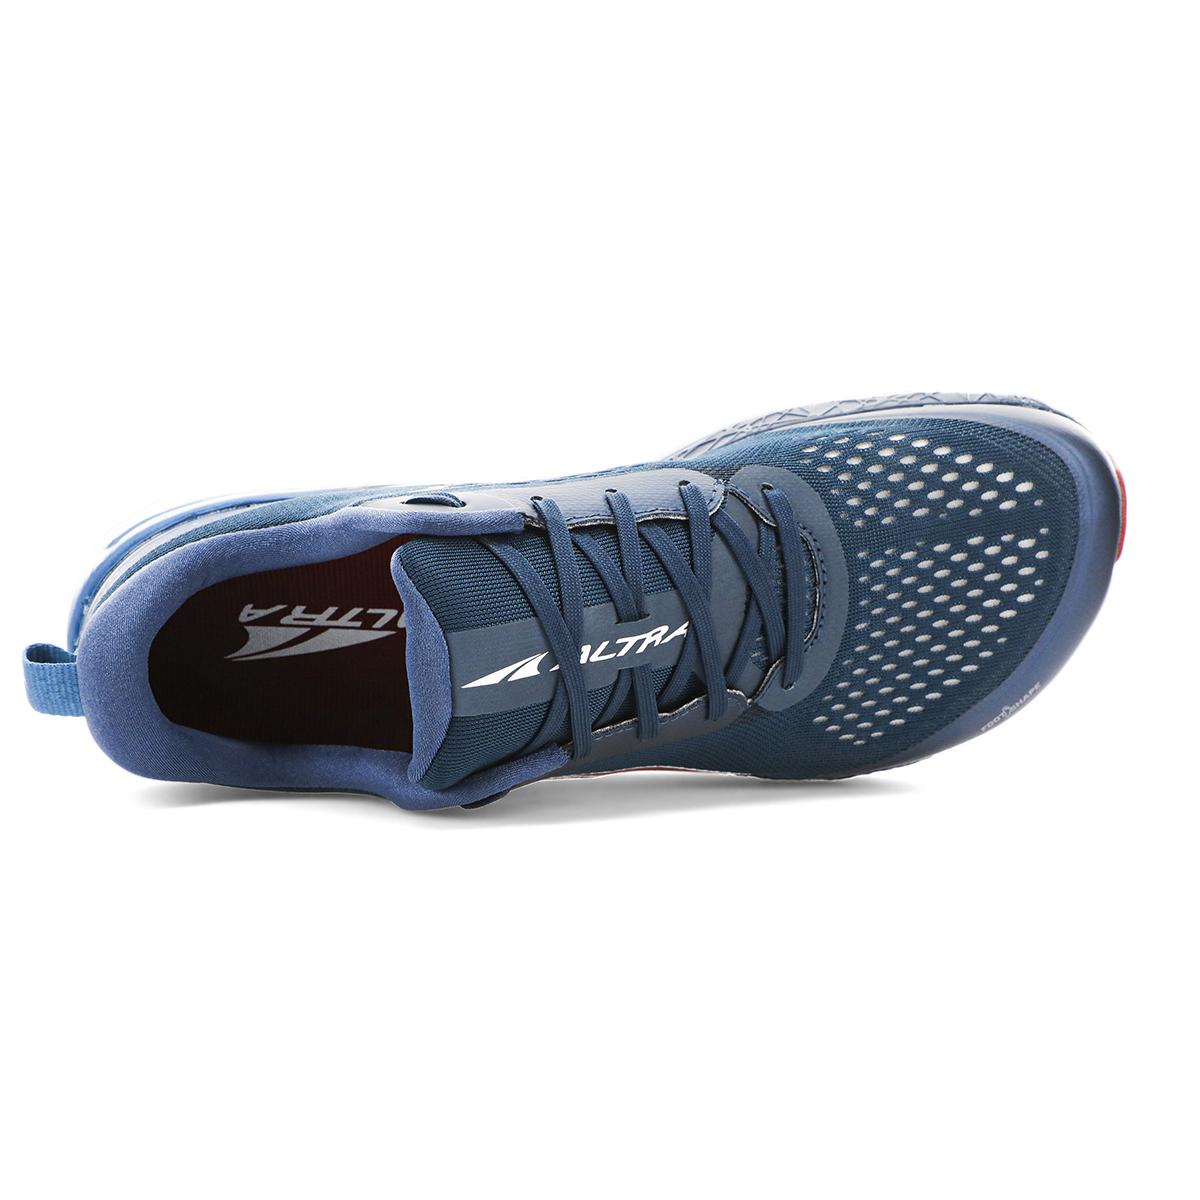 Men's Altra Paradigm 5 Running Shoe - Color: Blue Red - Size: 8.5 - Width: Regular, Blue Red, large, image 2